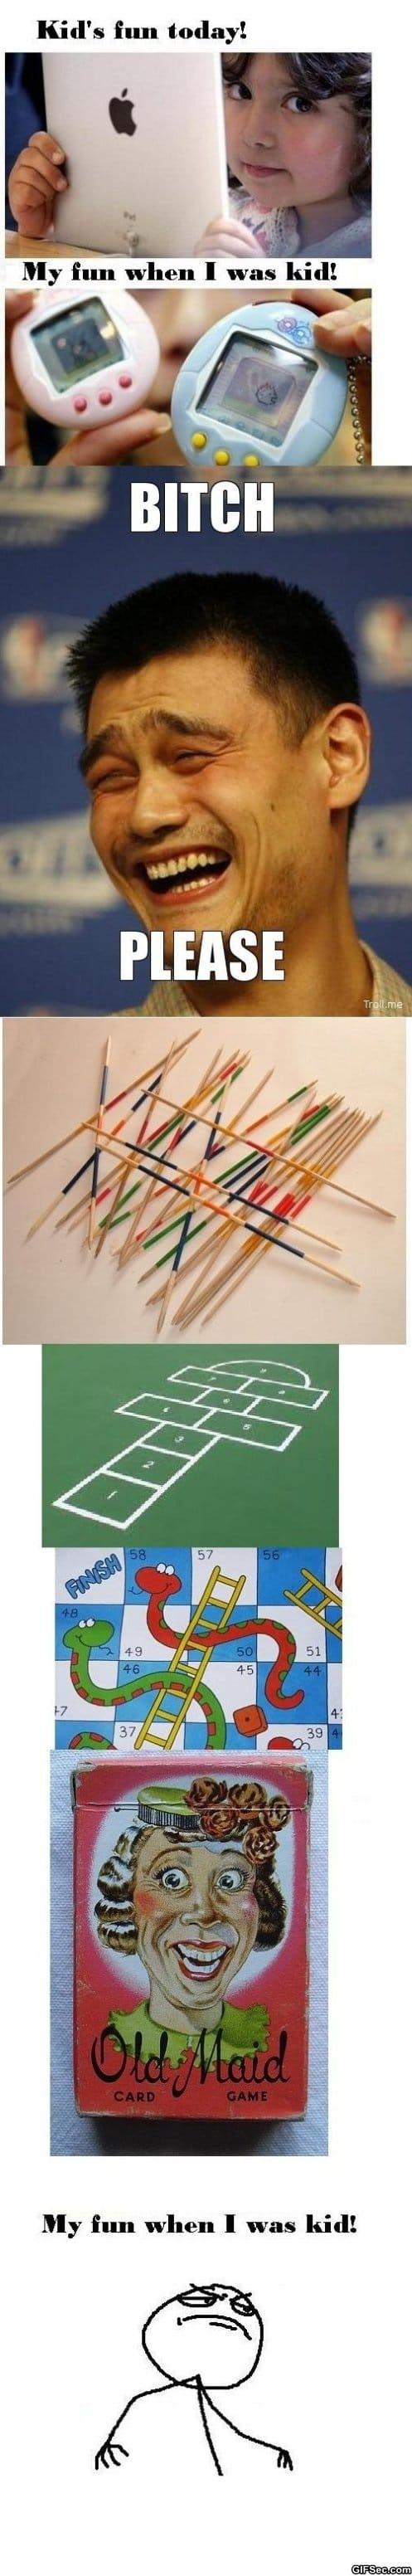 childhood-games